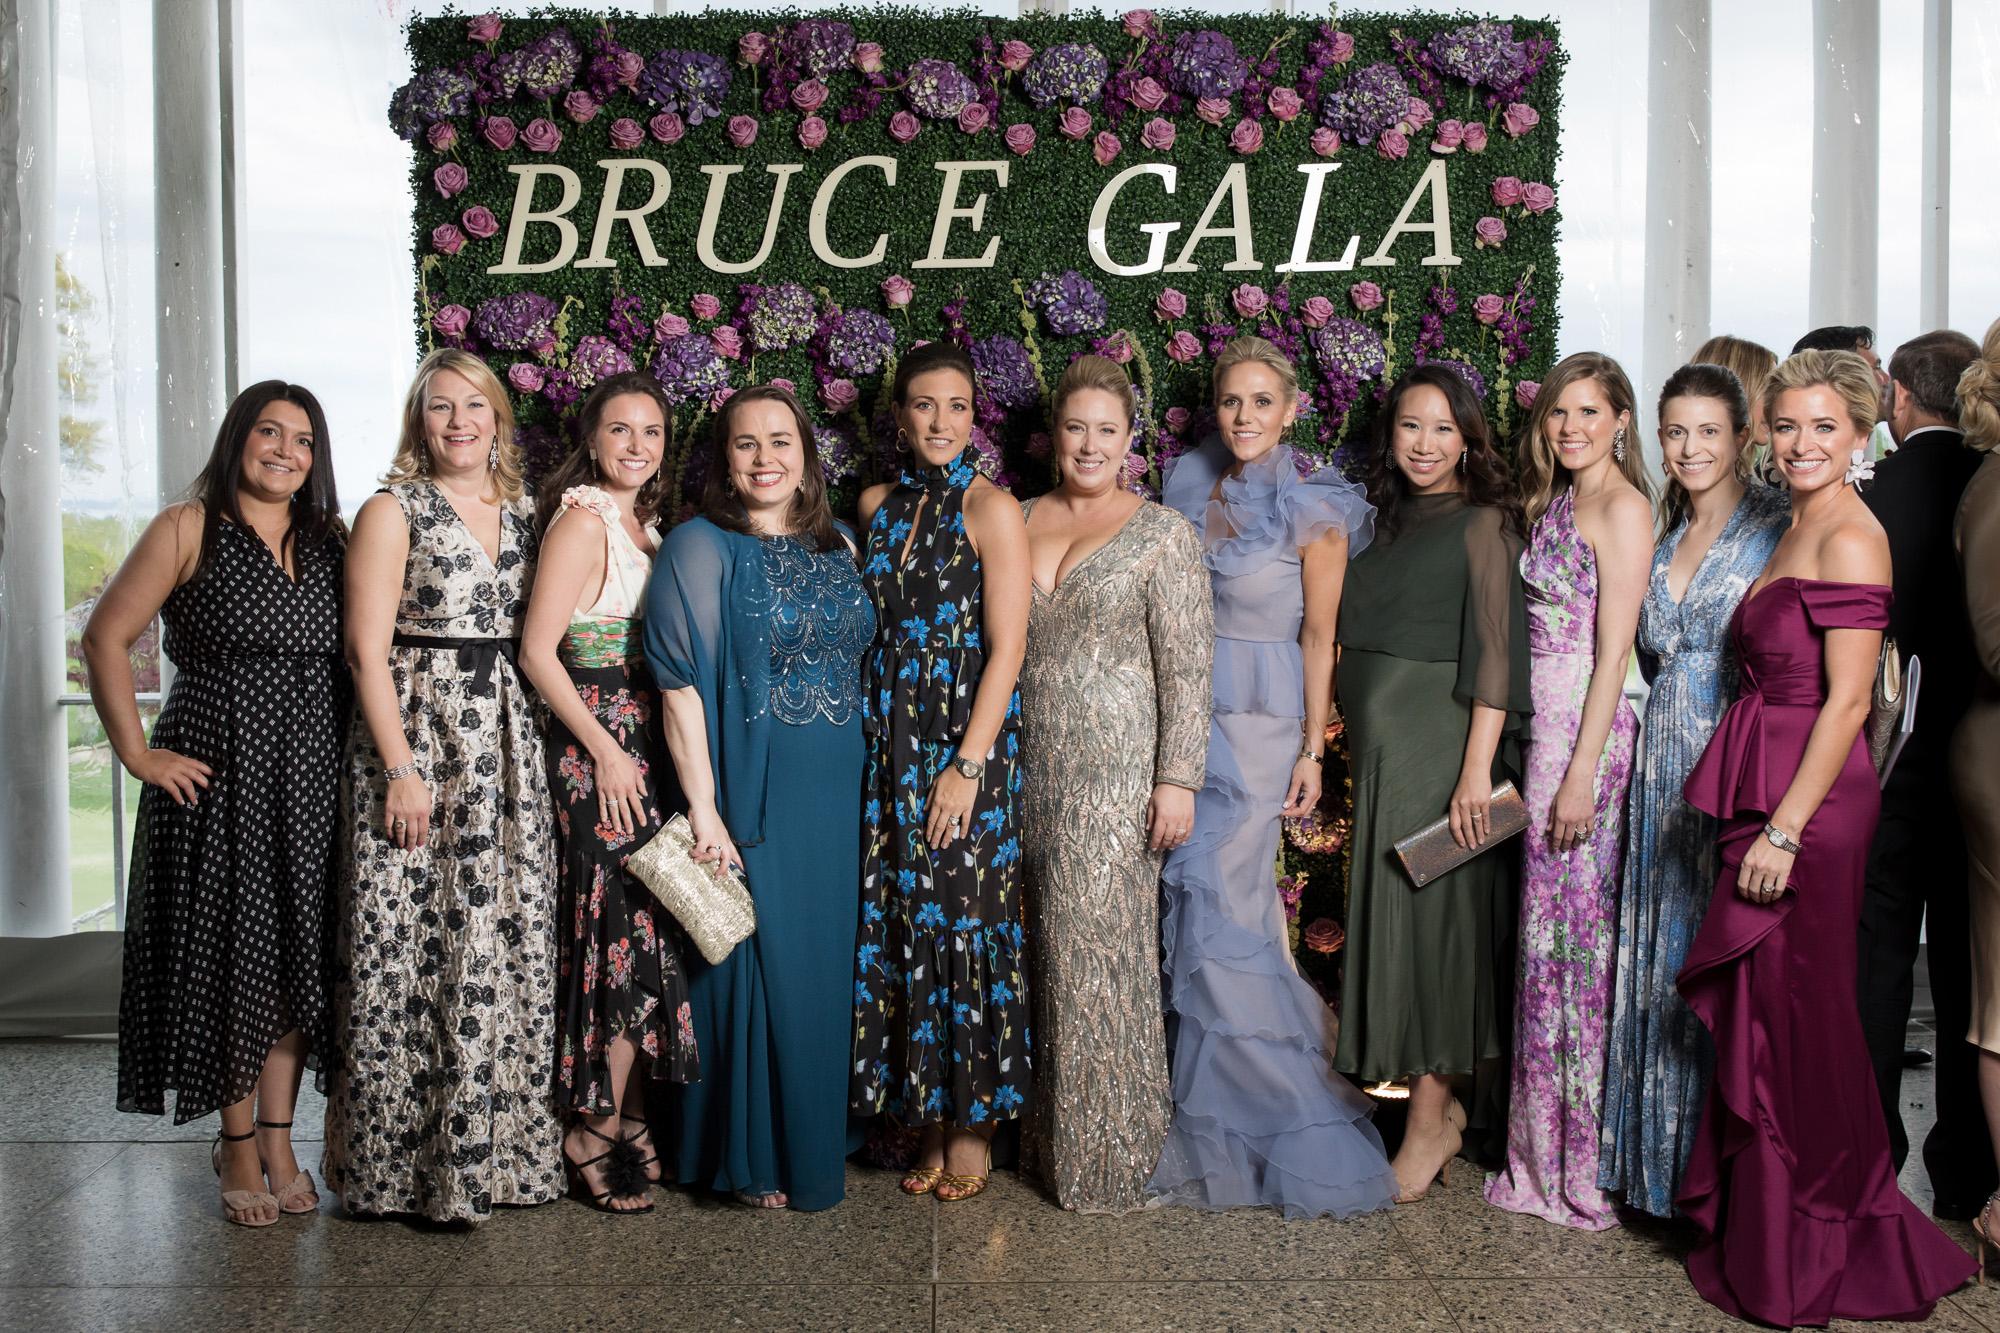 Bruce Contemporaries attend An Evening in the Enchanted Garden